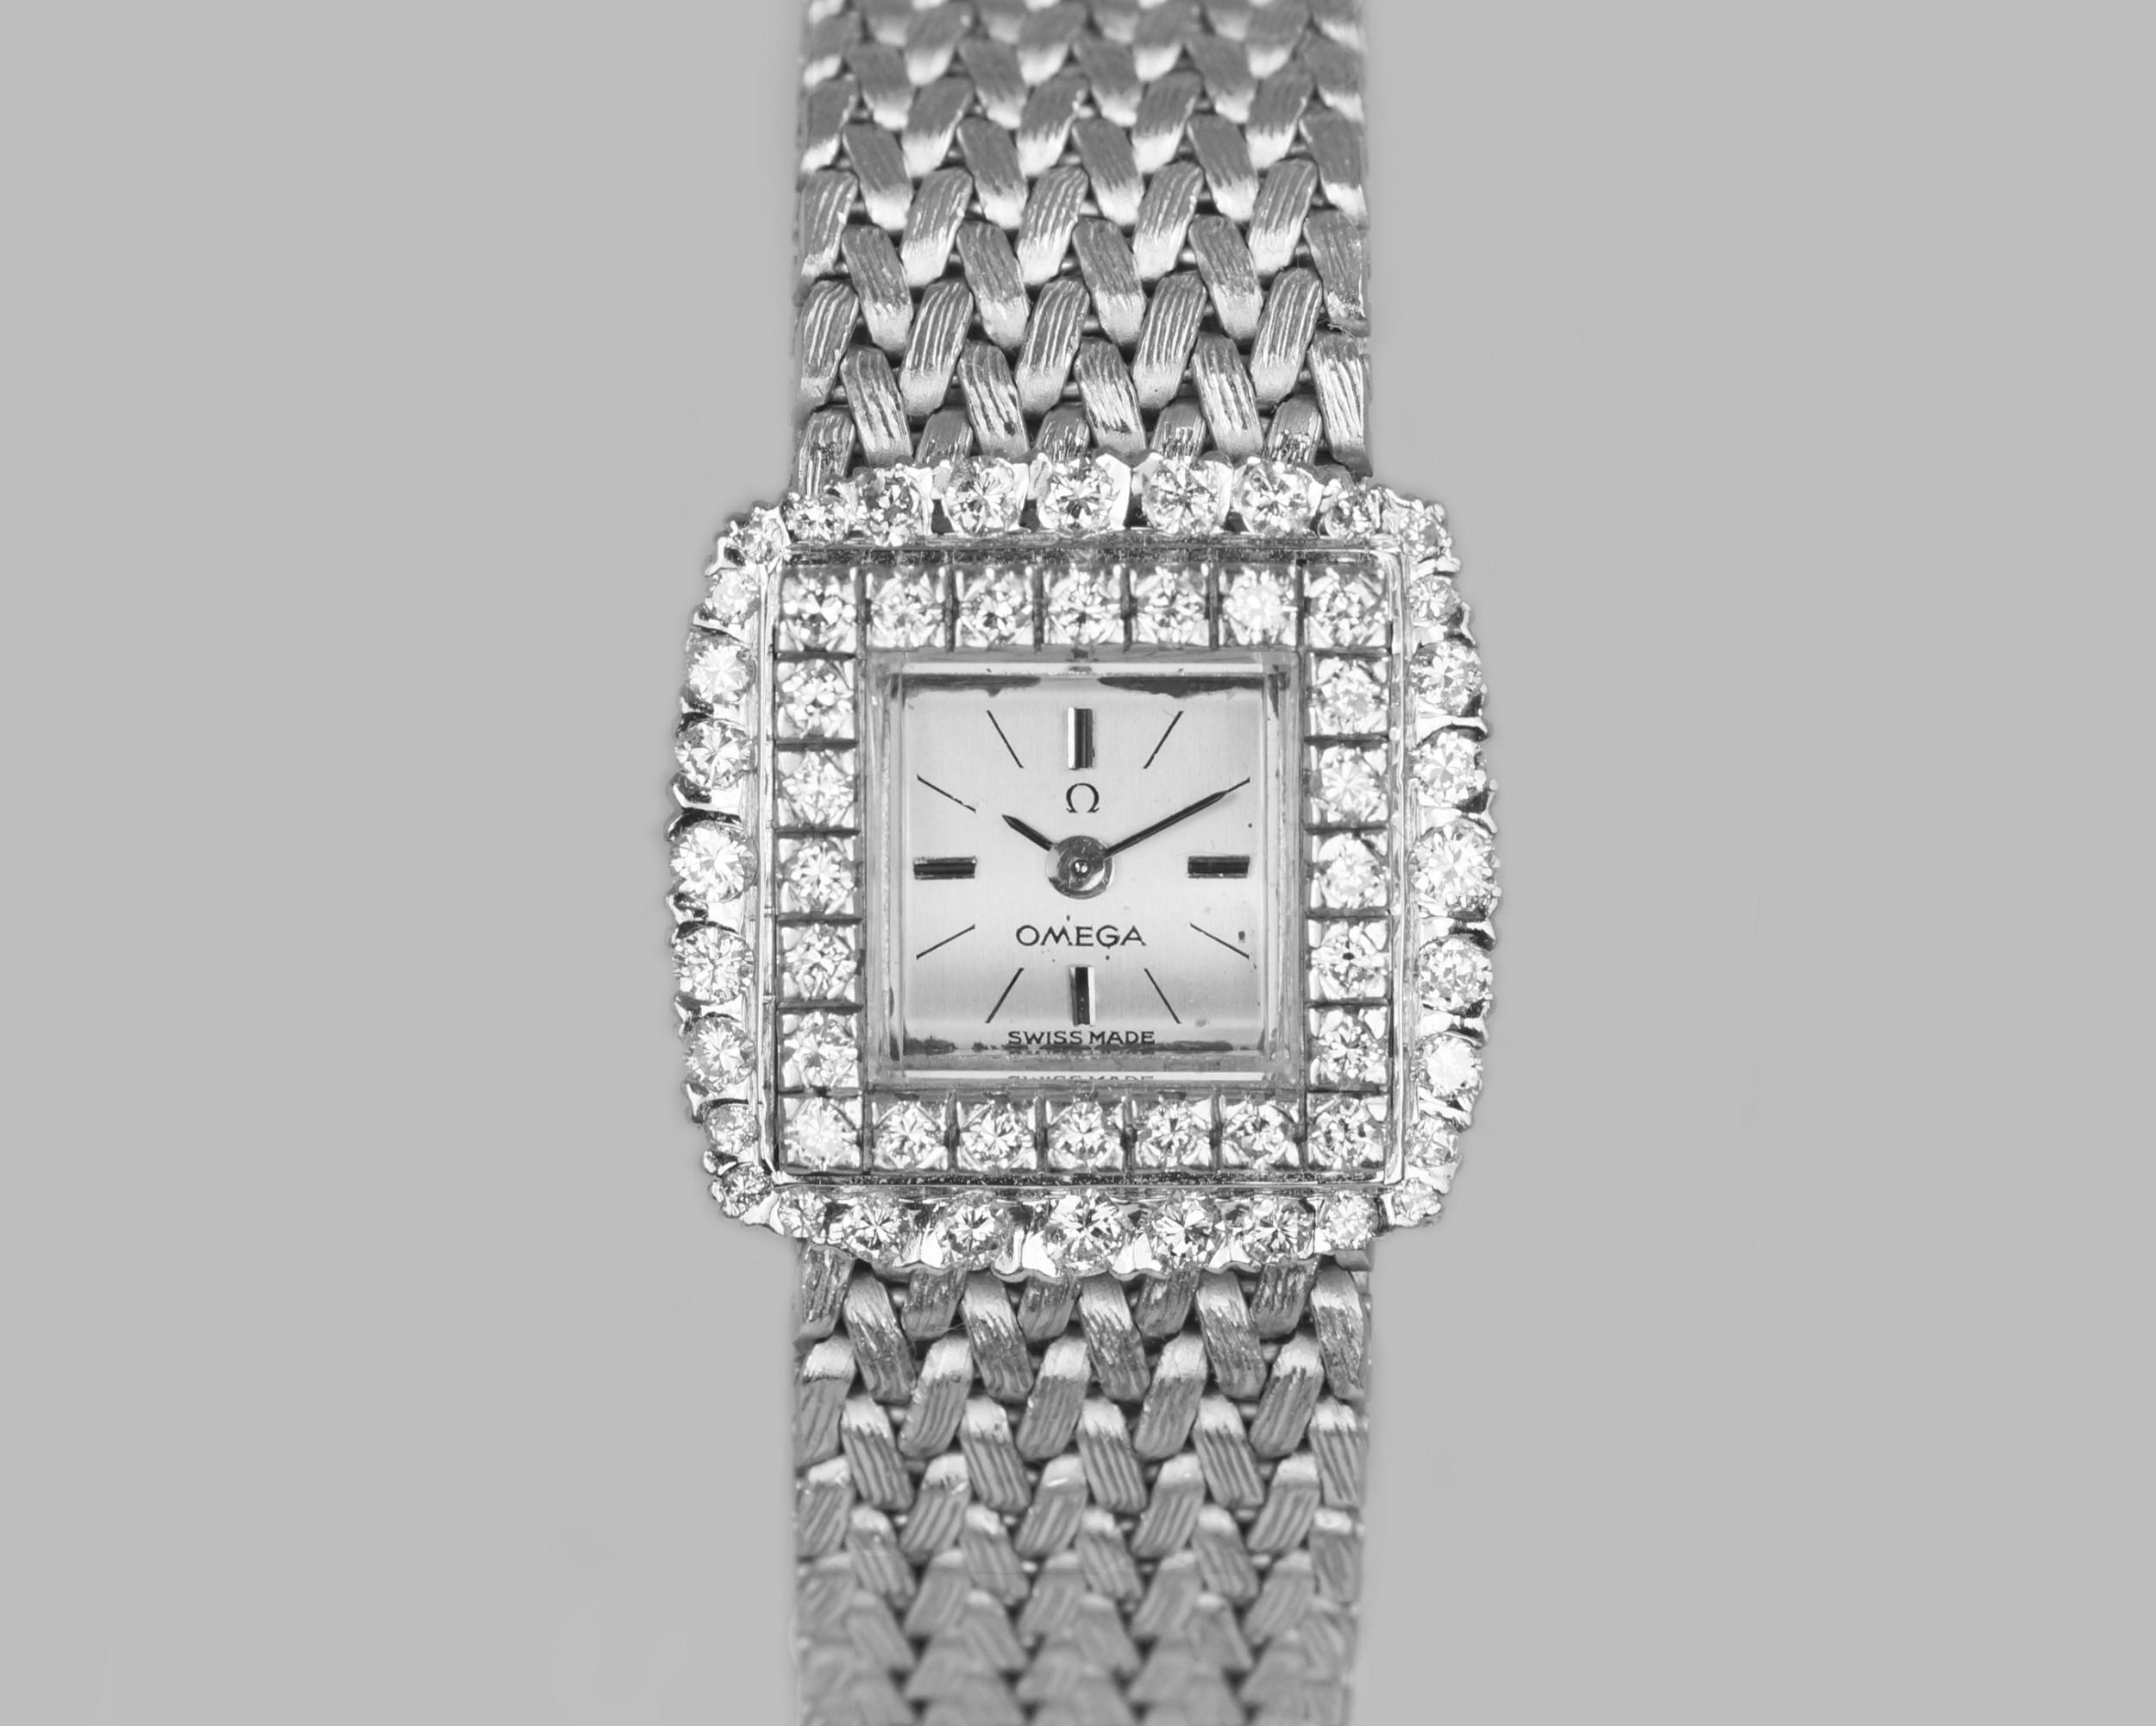 vintage omega diamond bracelet watch ladies 9ct gold 1960's 120ct diamond watch